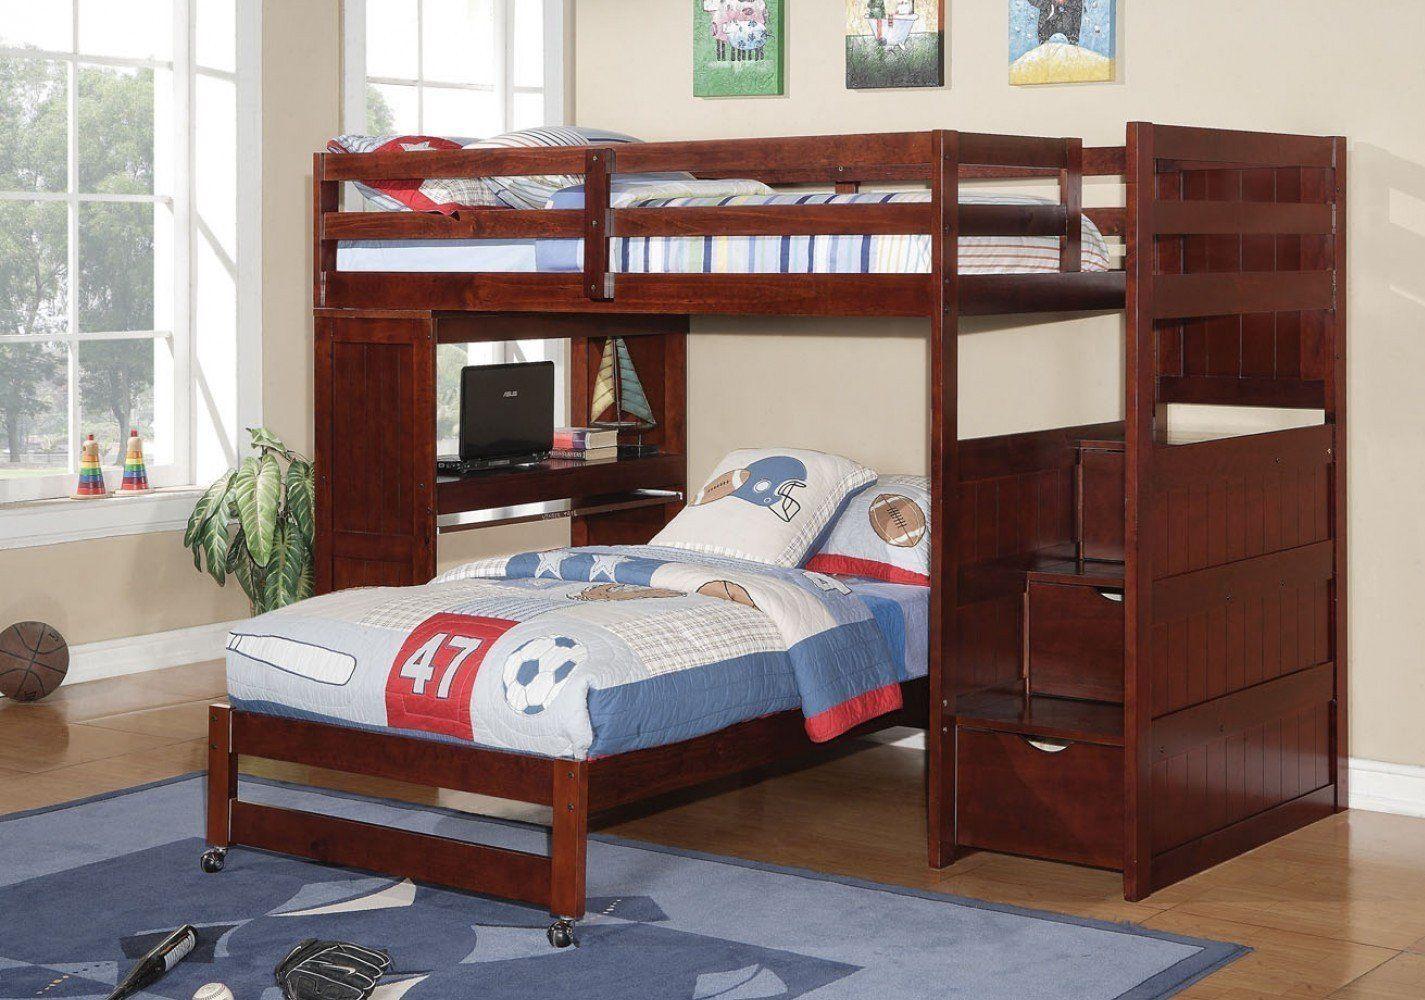 Ava Kidus Furniture Set with Twin Loft Bed Desk Dresser u Bookcase